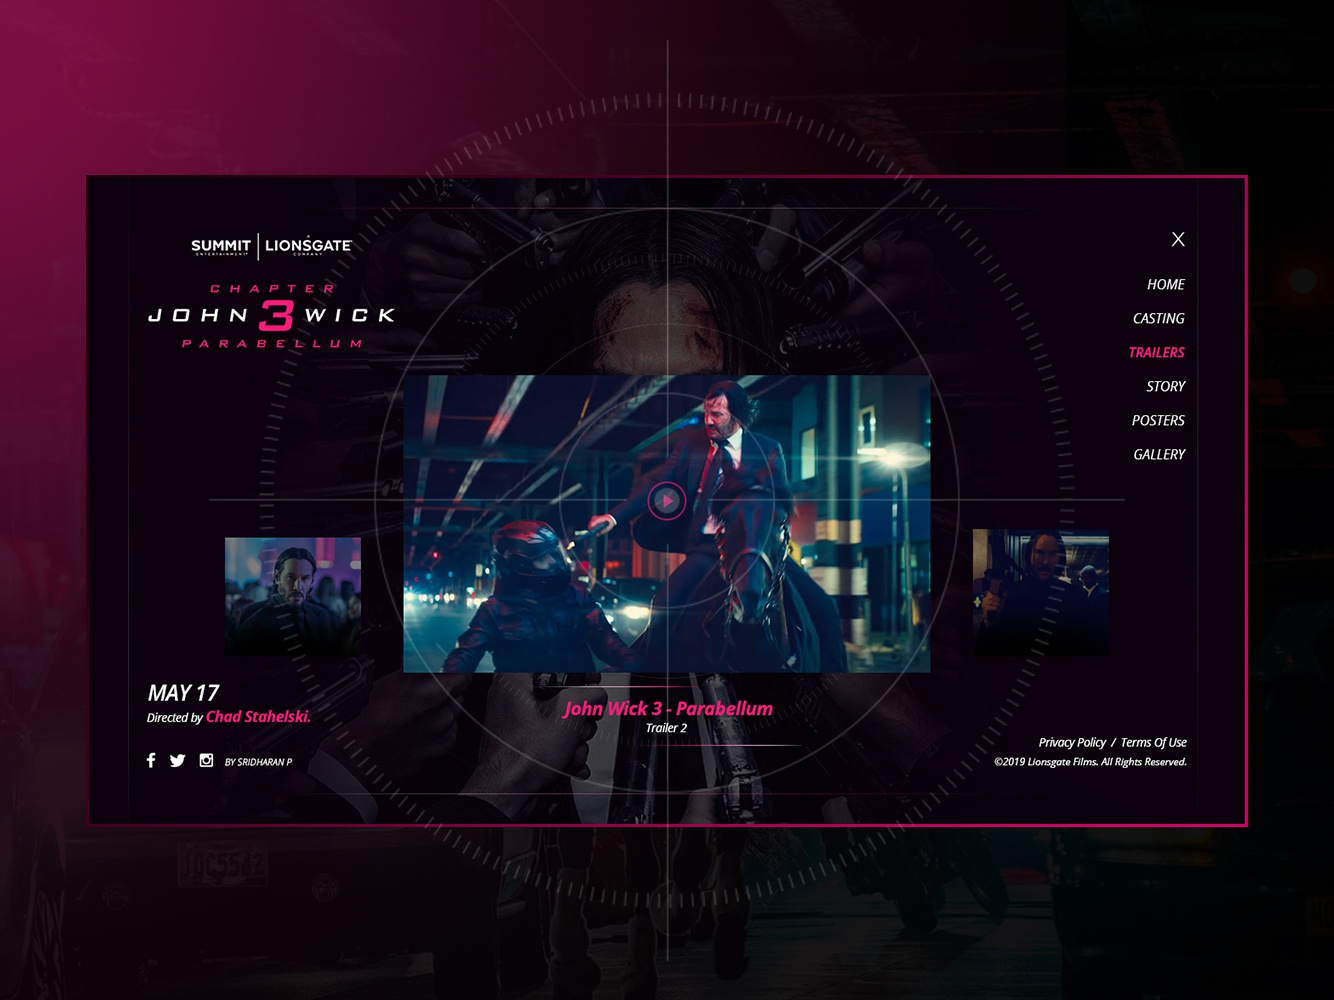 John Wick 3 - Website - Trailers Screen by Sridharan P | Dribbble